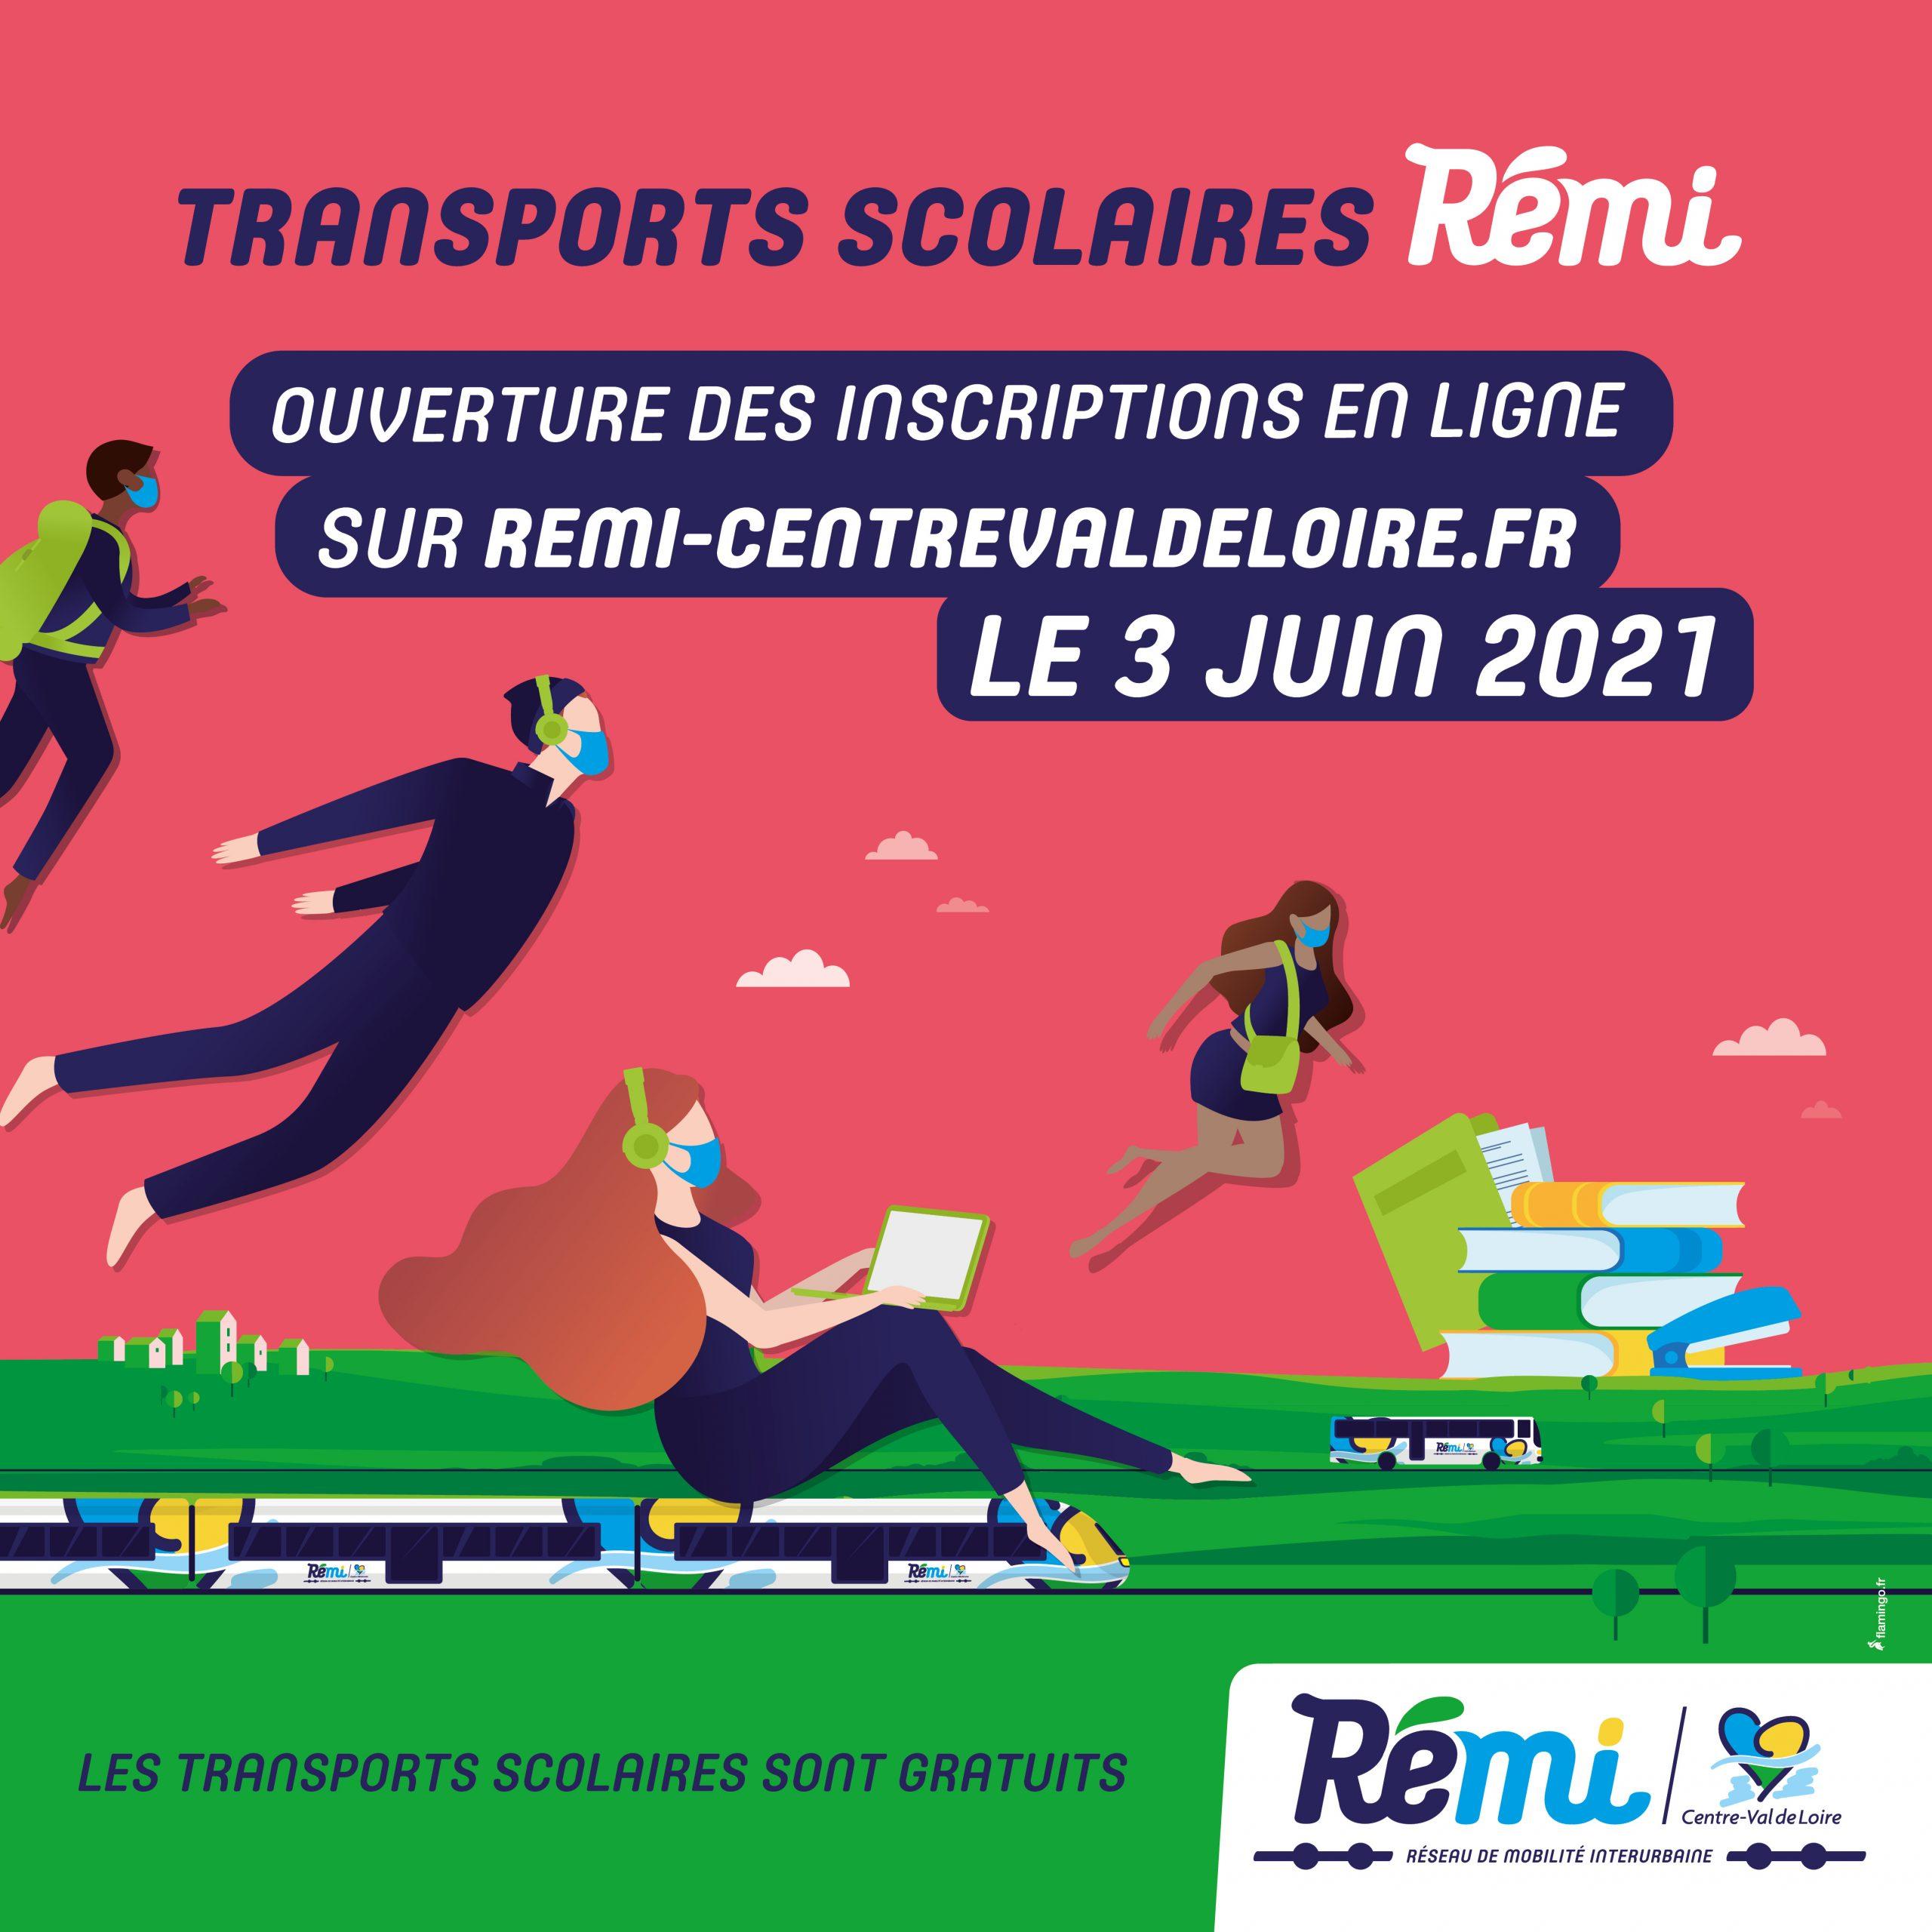 transport REMI inscription 2021 22.jpg